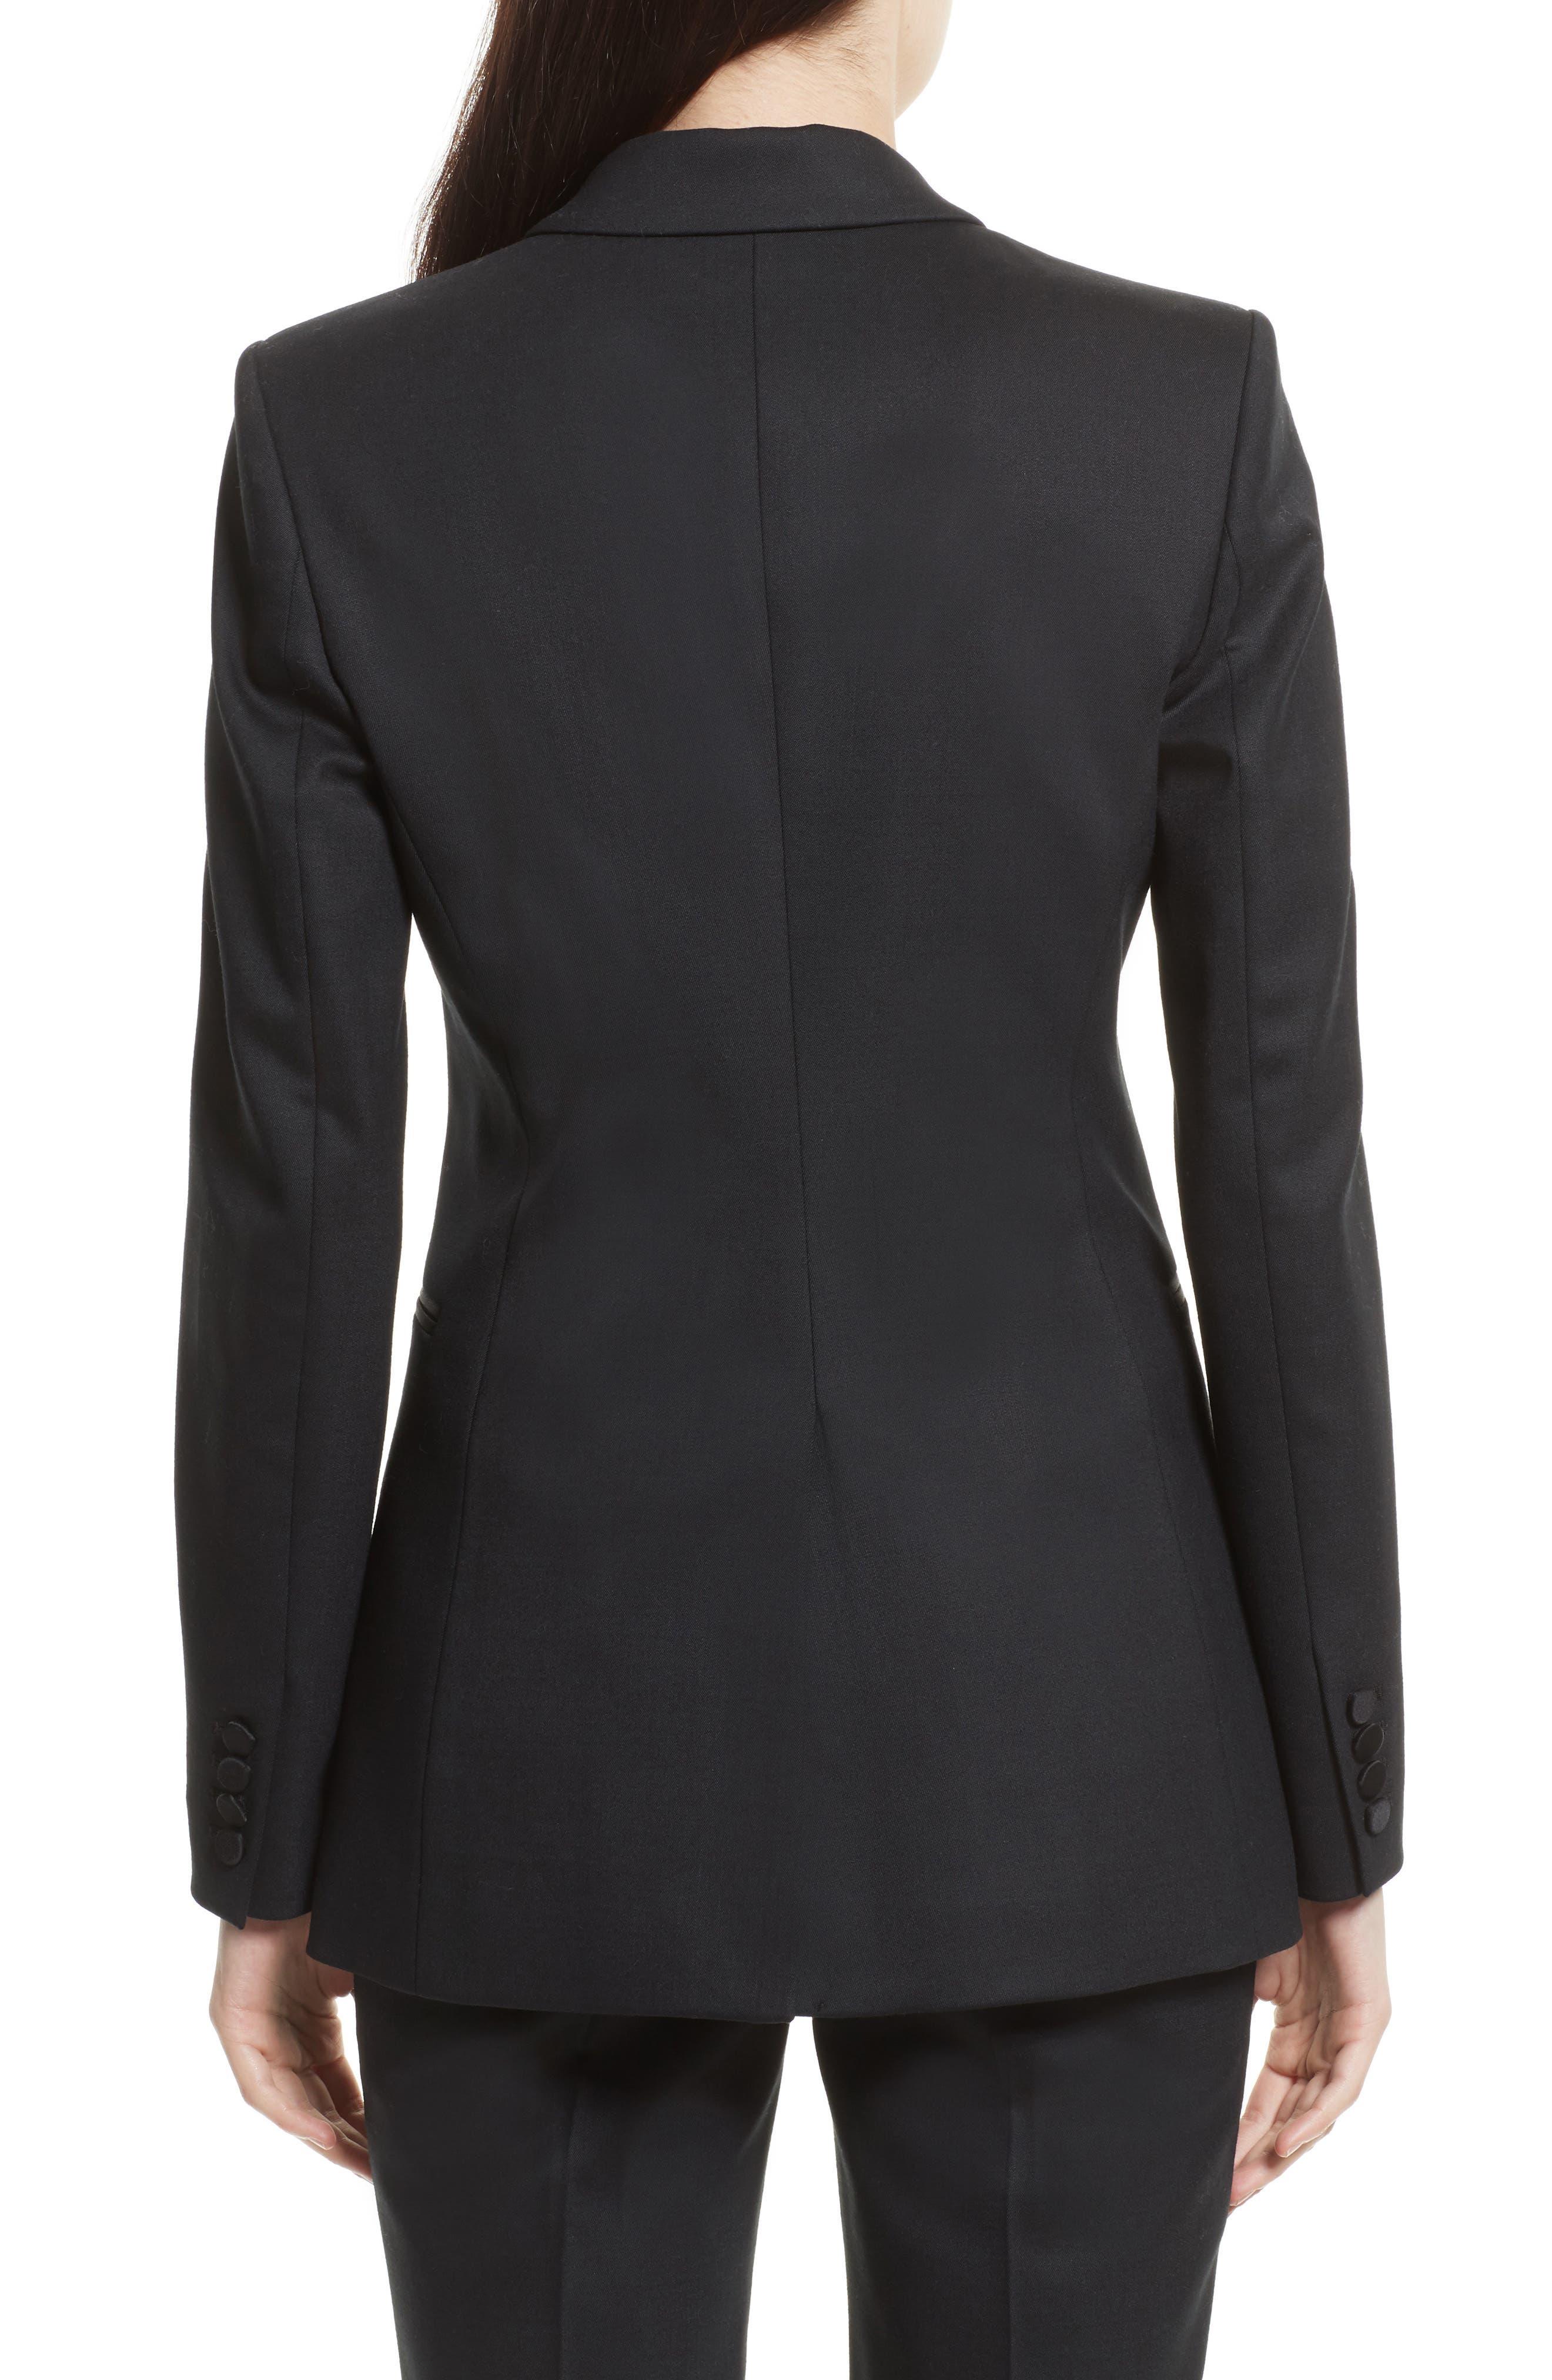 Wool Blend Tuxedo Jacket,                             Alternate thumbnail 2, color,                             Black